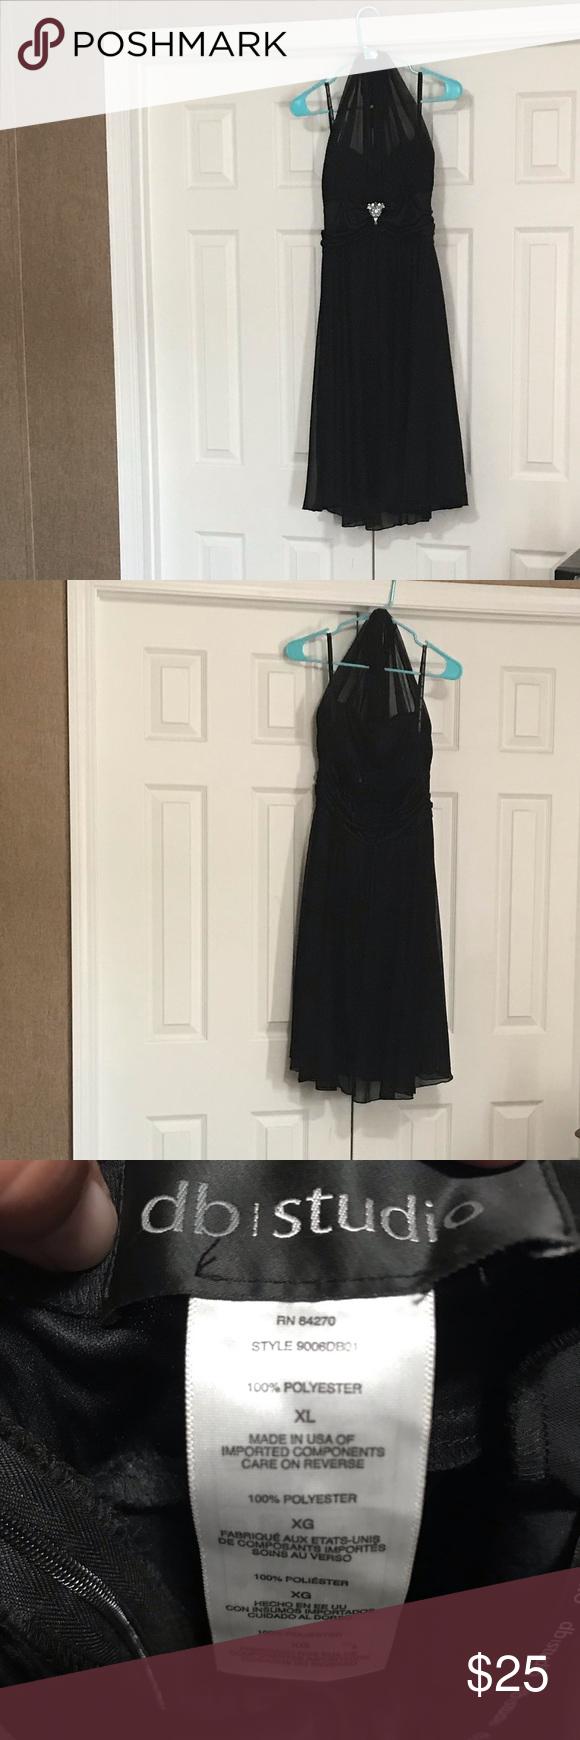 David S Bridal Black Dress Size Xl Dresses Black Dress Black Sleeveless Dress [ 1740 x 580 Pixel ]